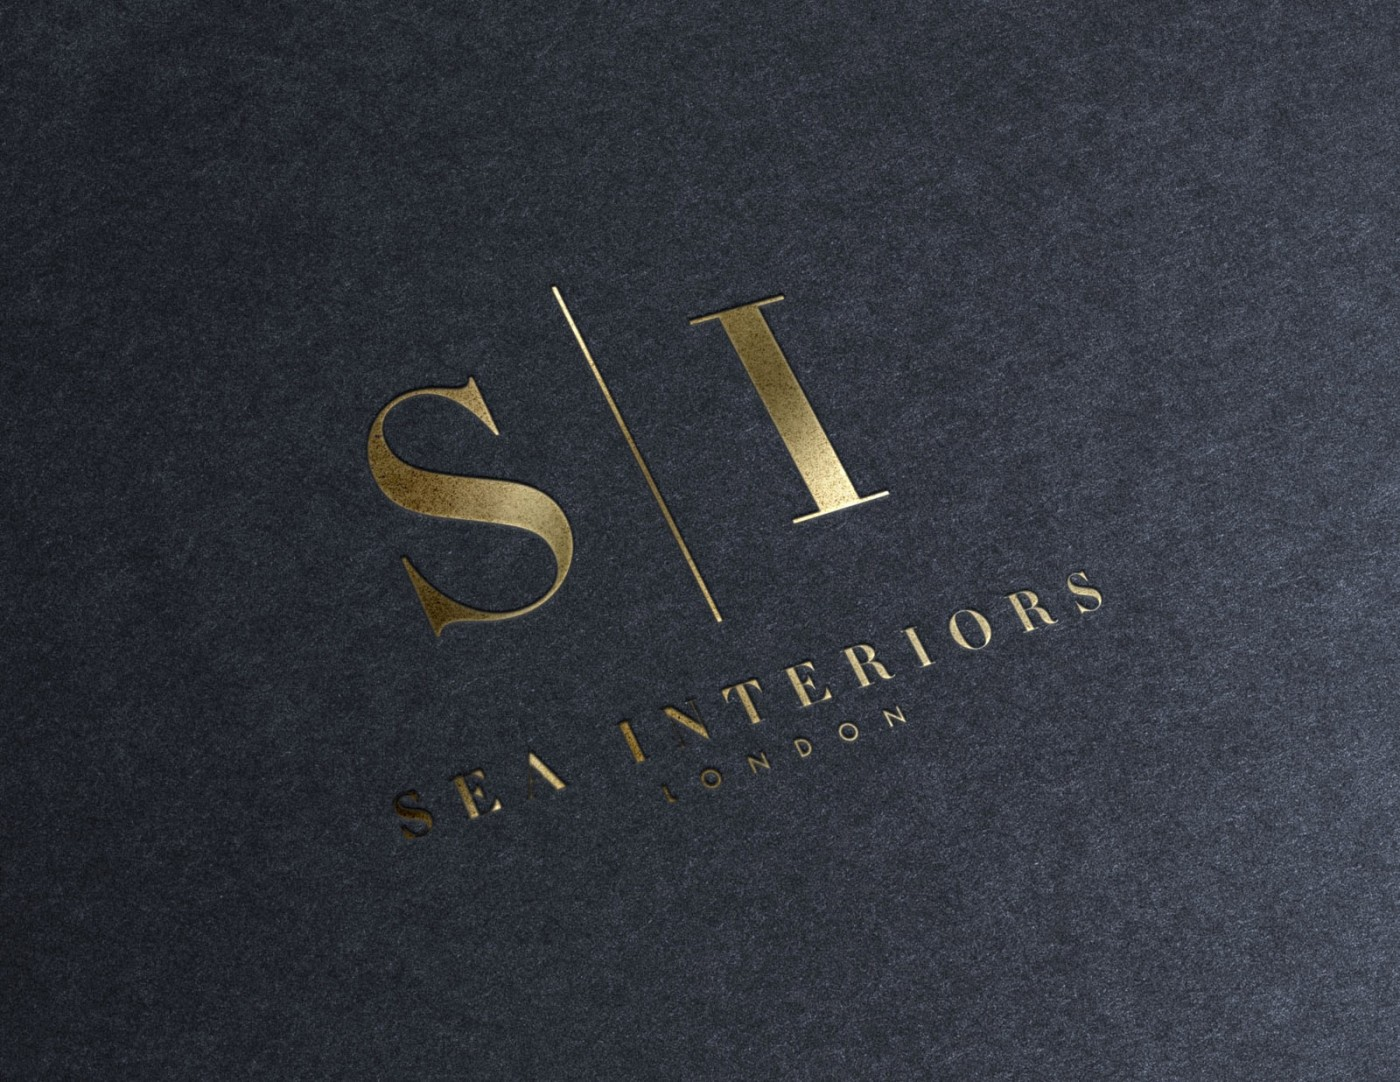 interior-designer-logo-branding-london01